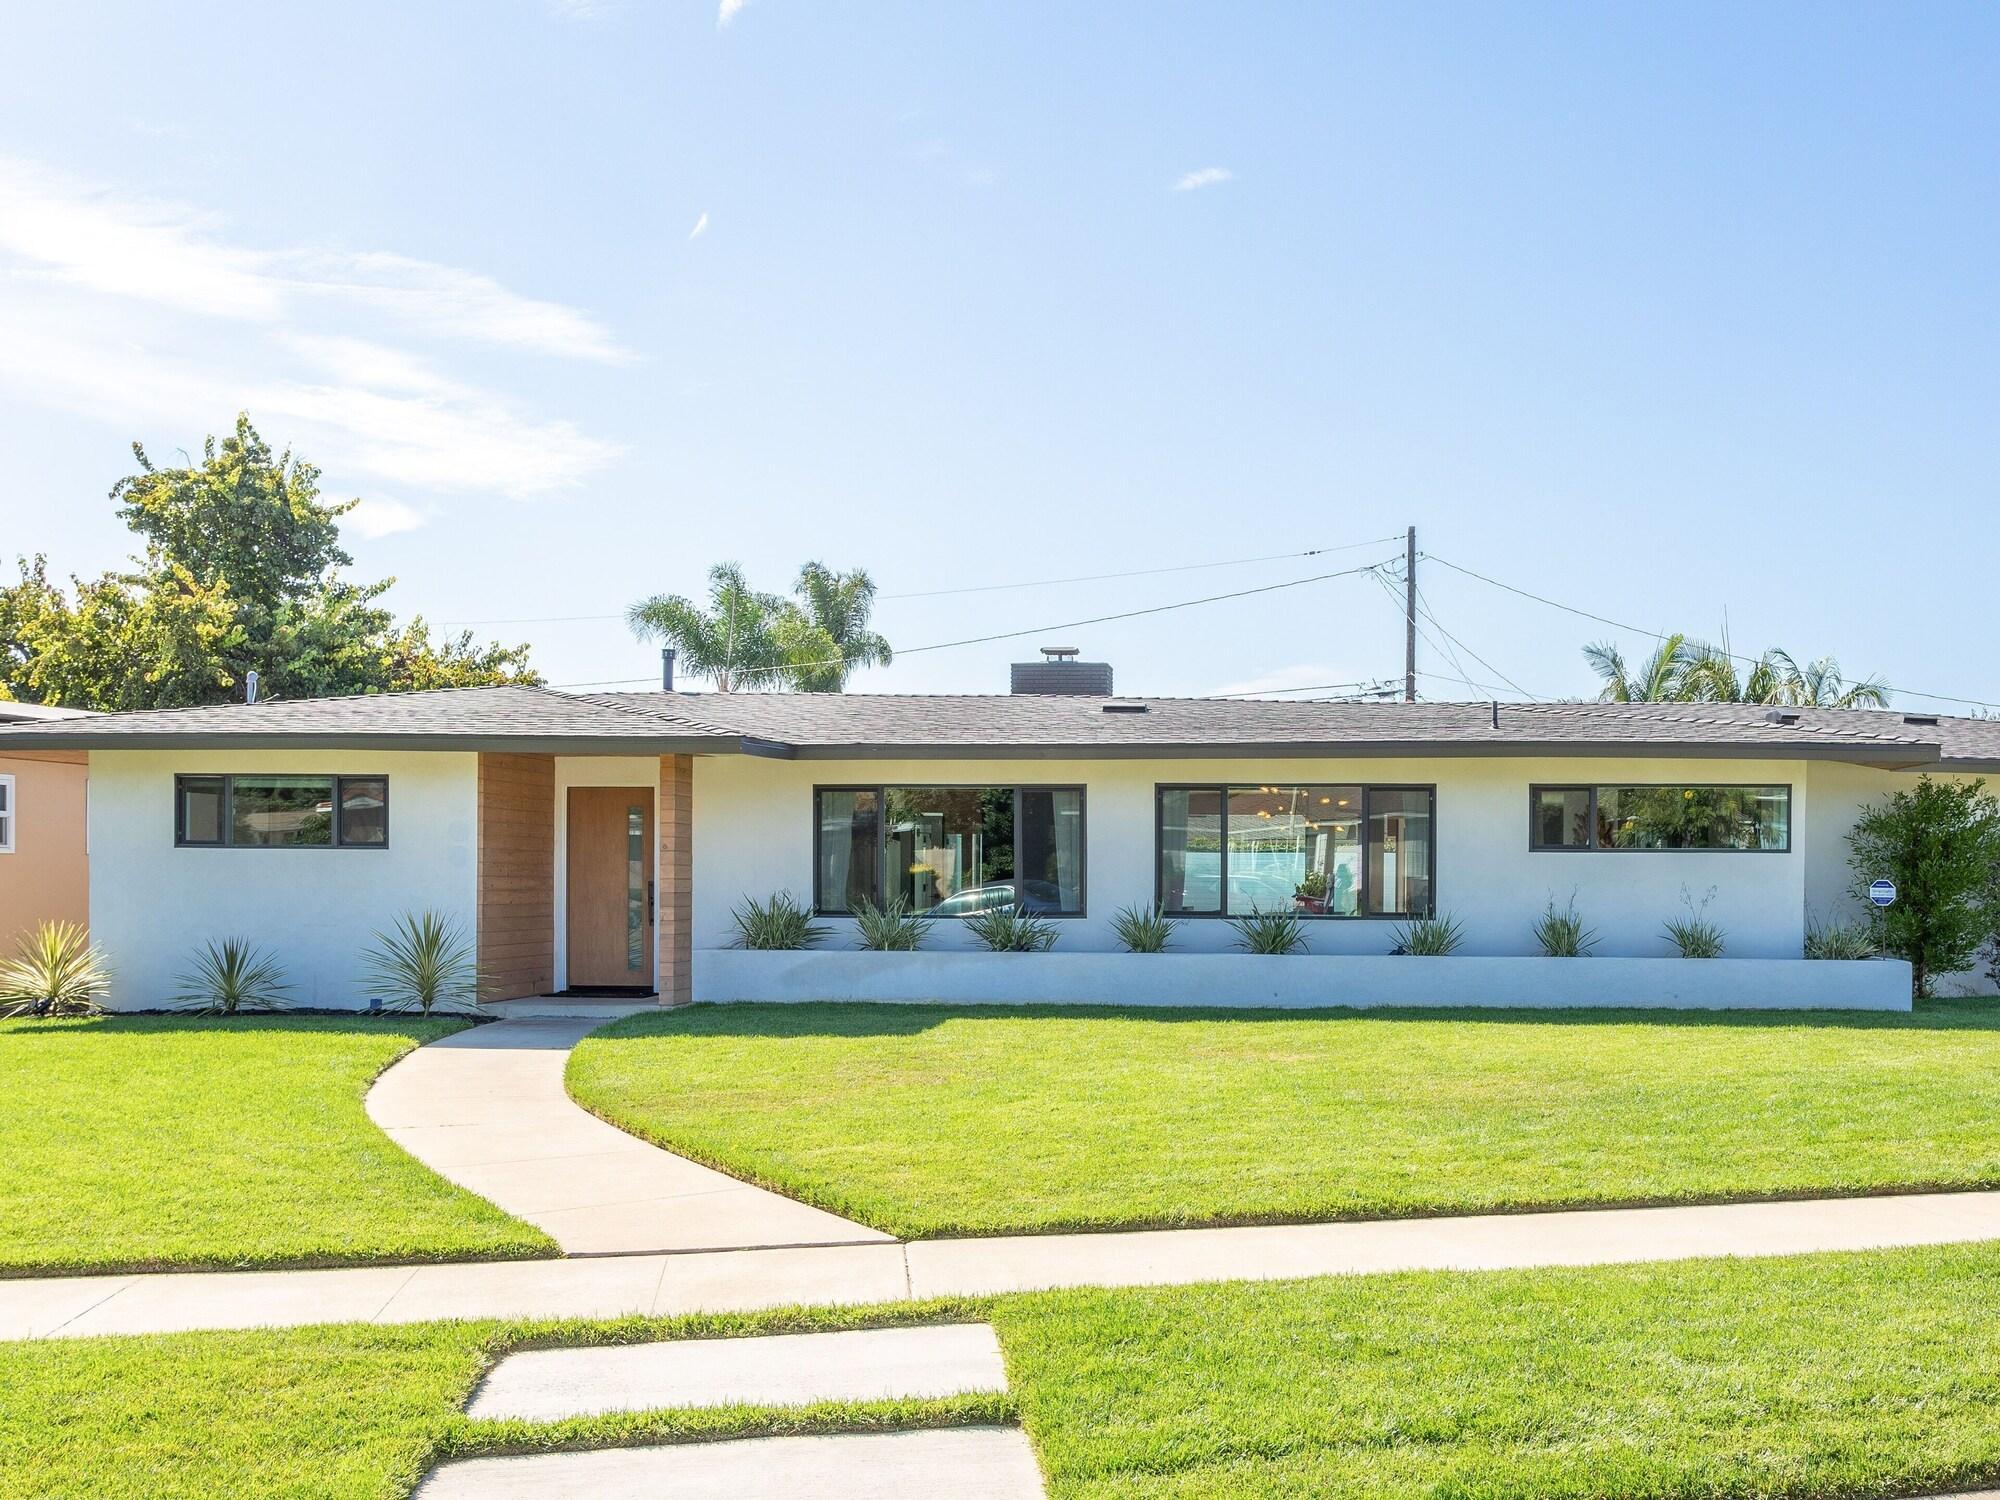 New Listing Mid century Modern Paradise W Pool 3 Bedroom Home